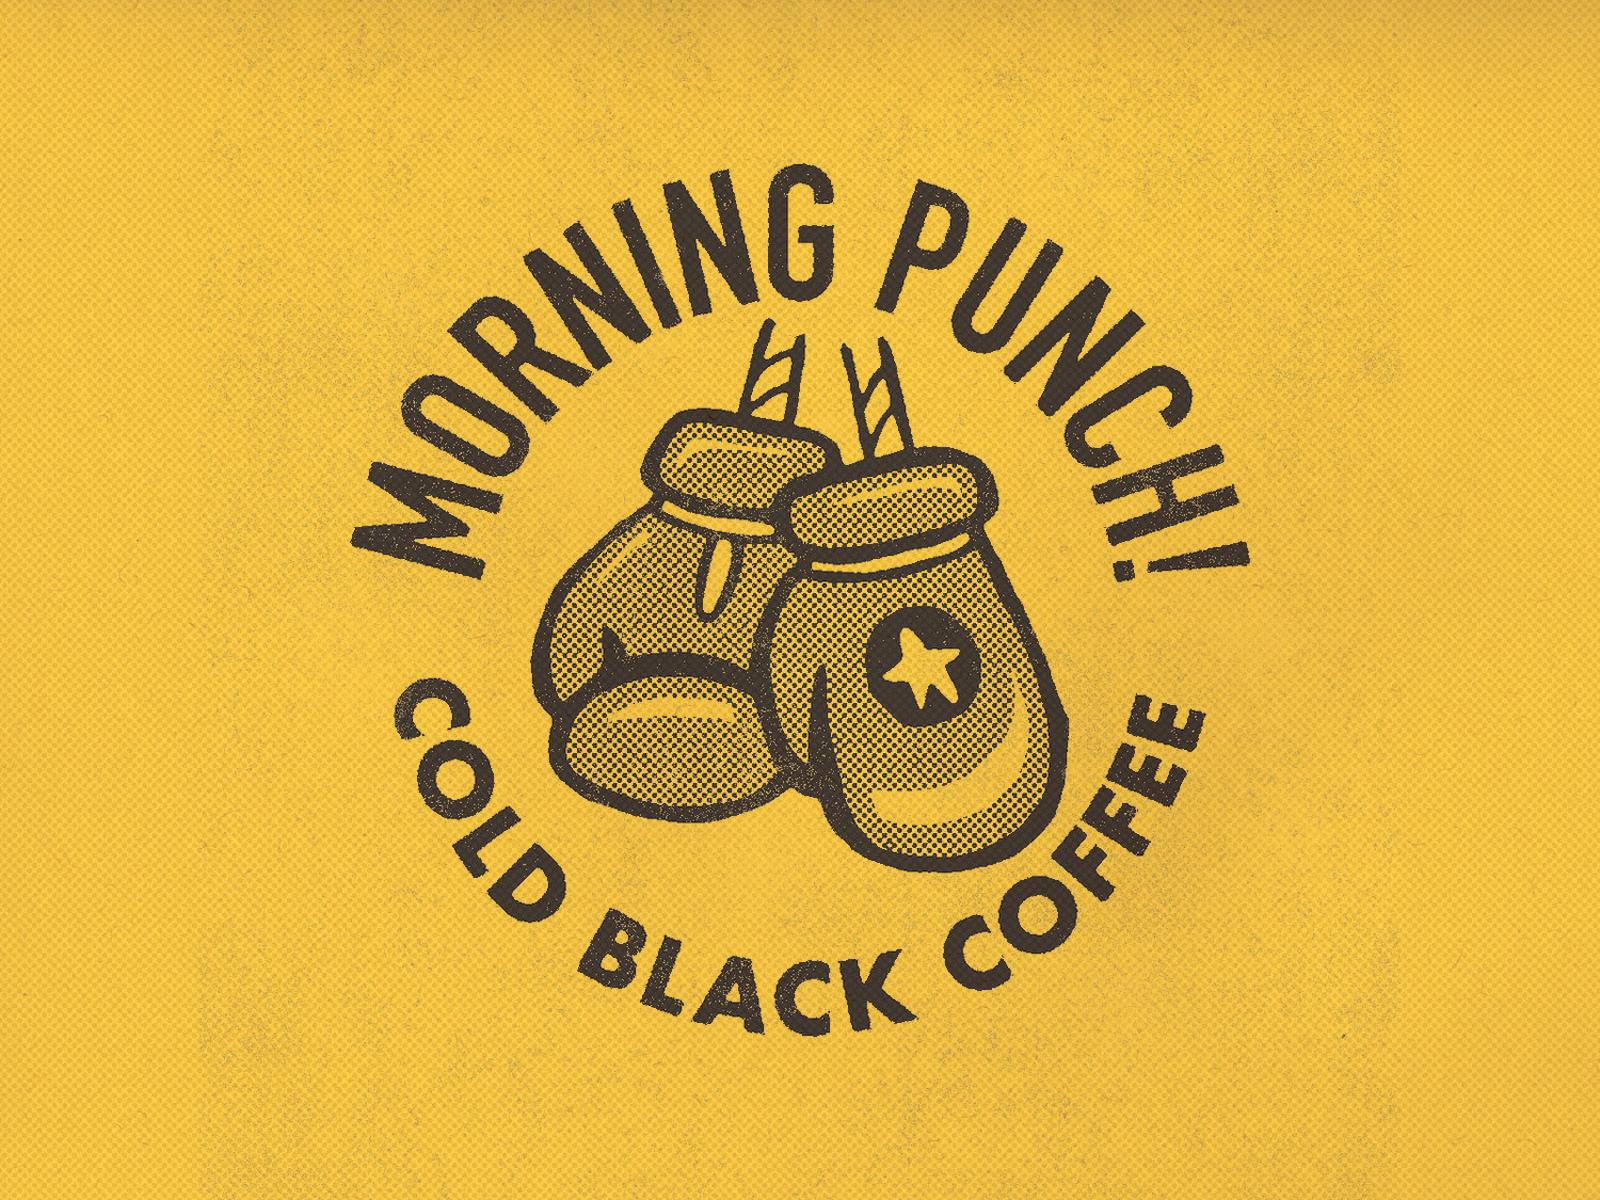 stuffed-brain-studio-morning-punch-brand-identity-03.png